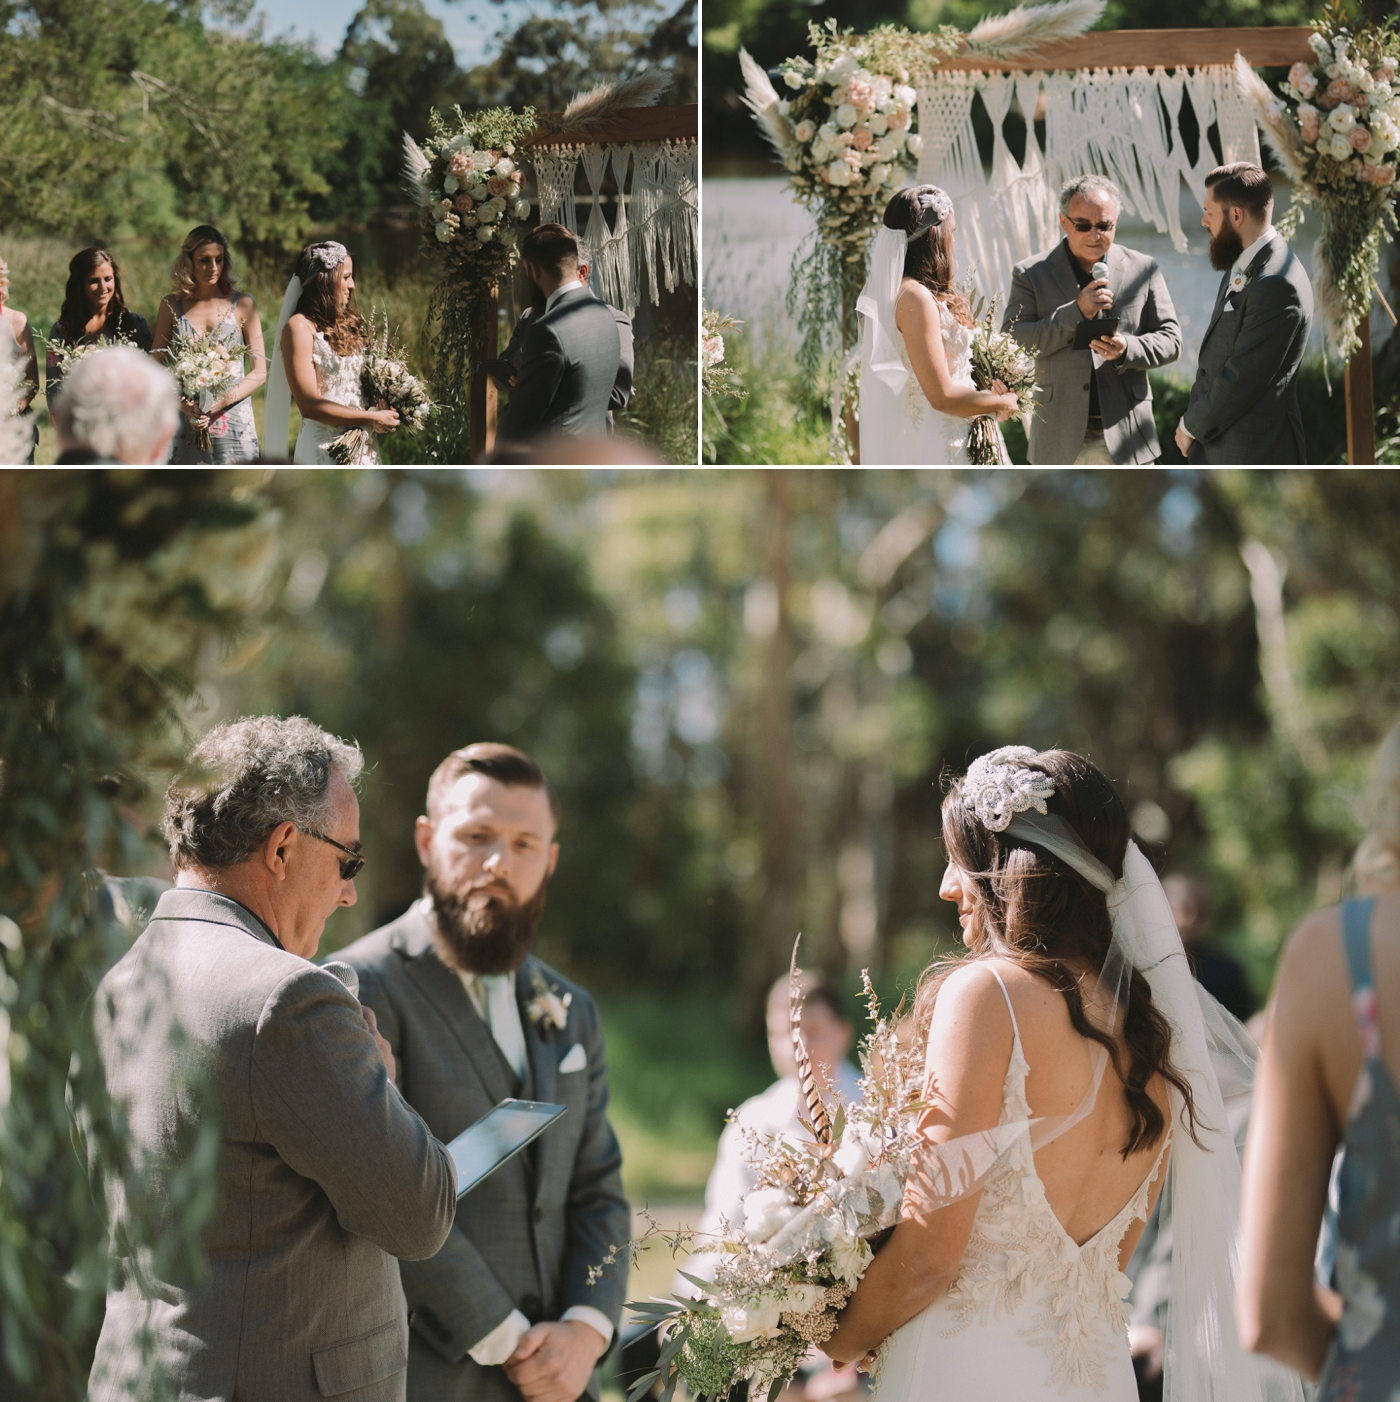 Maddy & Wes - K1 by Geoff Hardy Wedding - Adelaide Wedding Photographer - Natural wedding photography in Adelaide - Katherine Schultz_0027.jpg